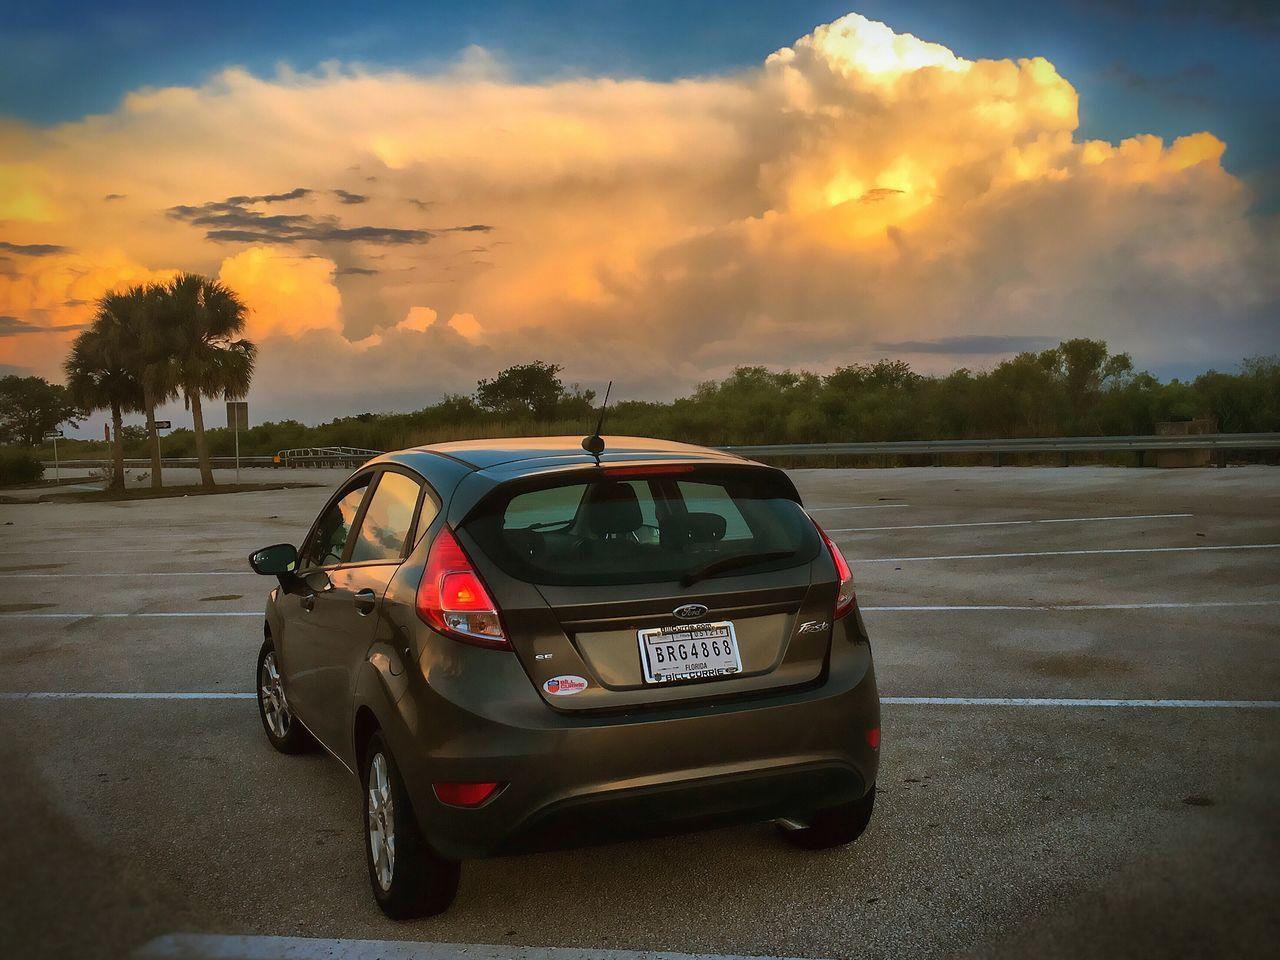 Small Car Cloudscape Golden Hour Alligator Alley